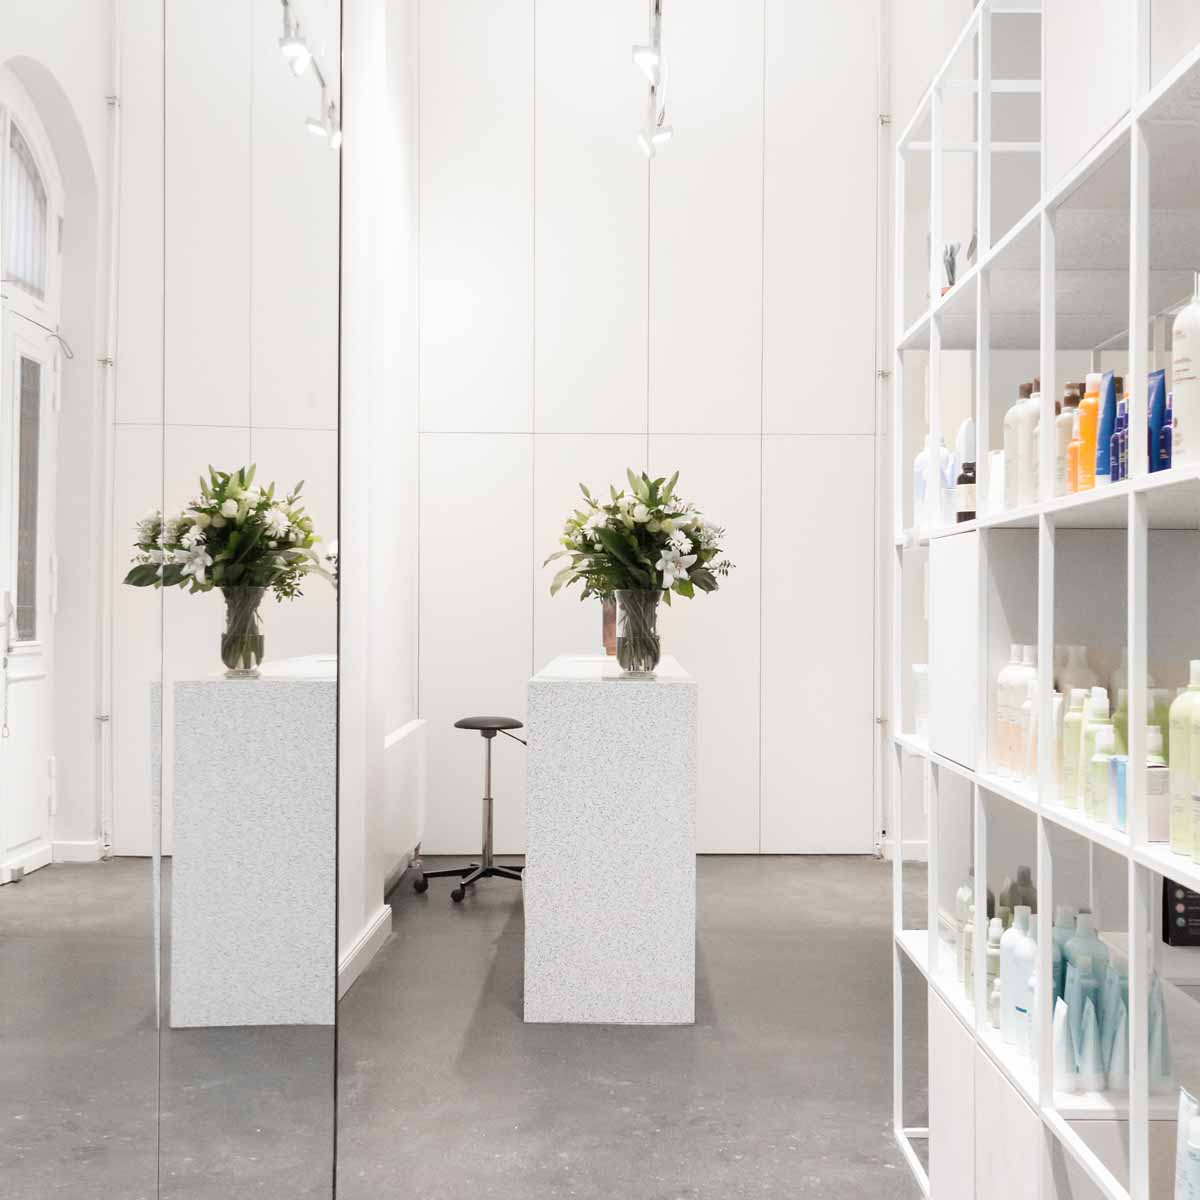 Shift Haircare im Bricks in Schöneberg - Berlin | CREME GUIDES